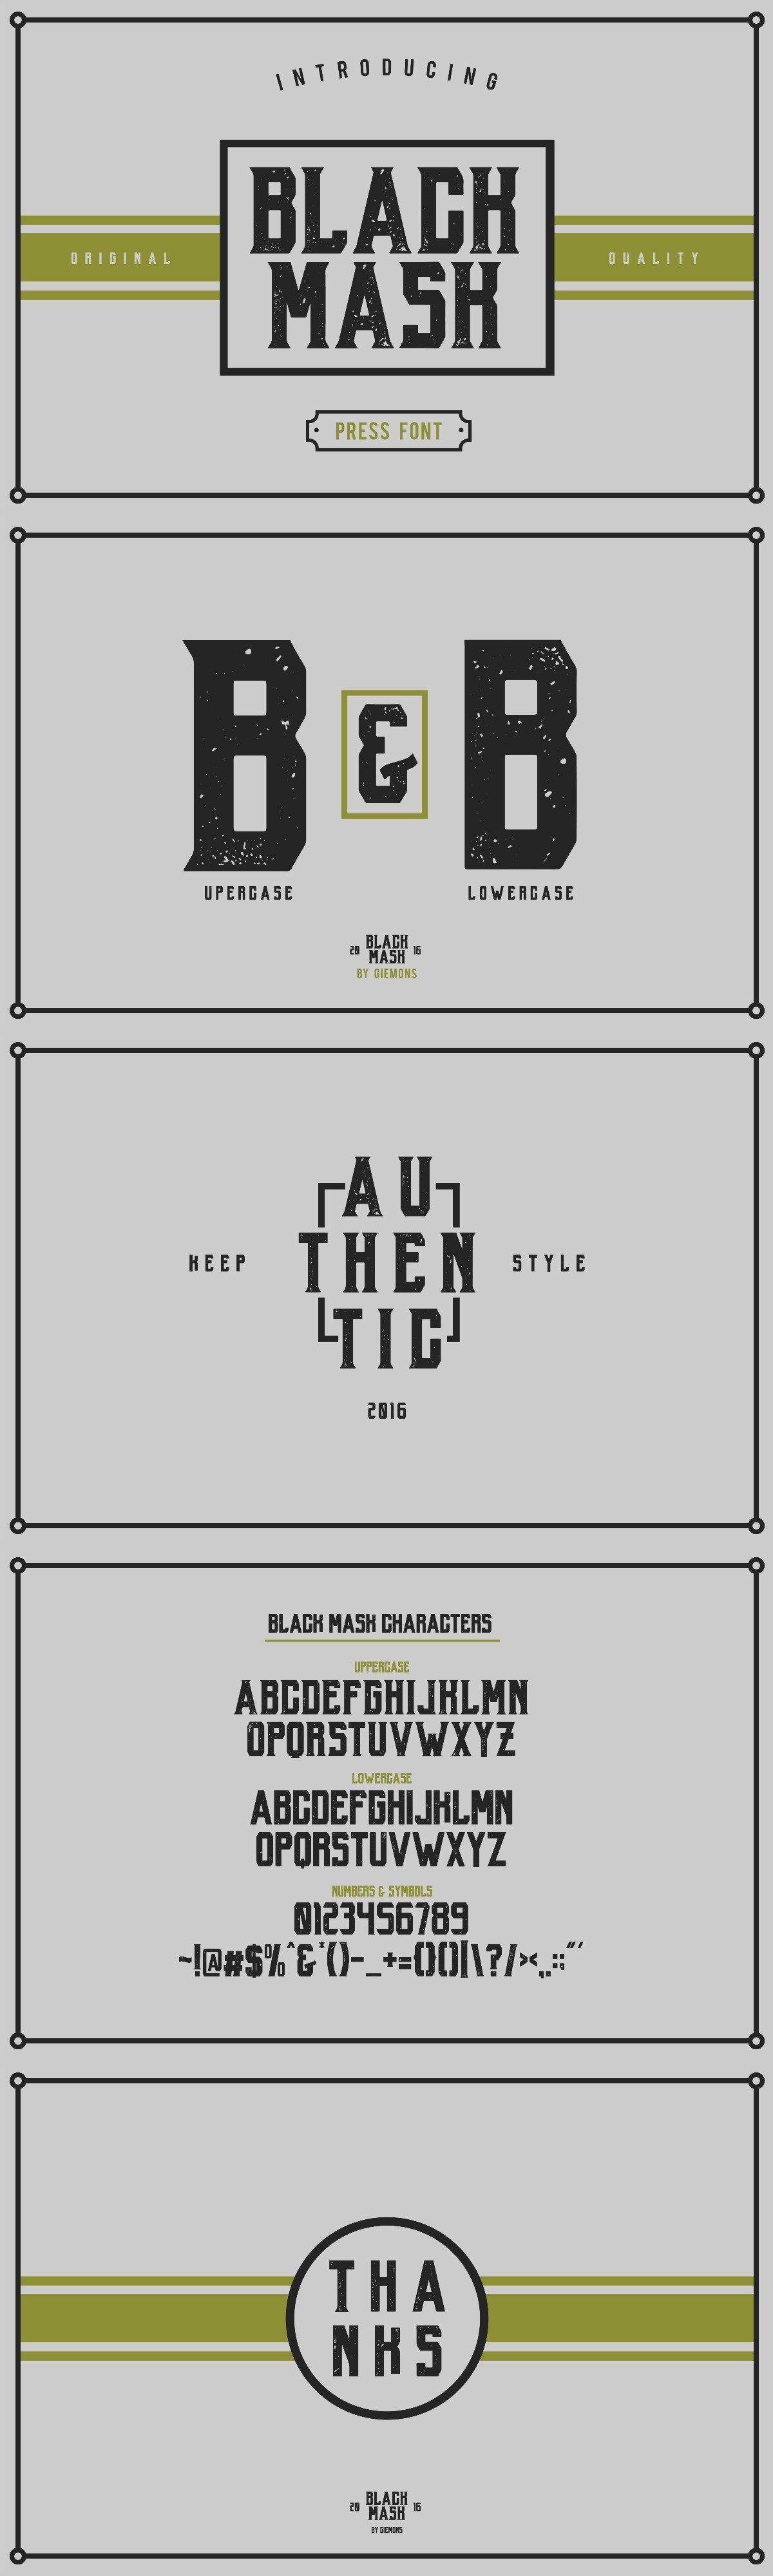 Black Mask Press font